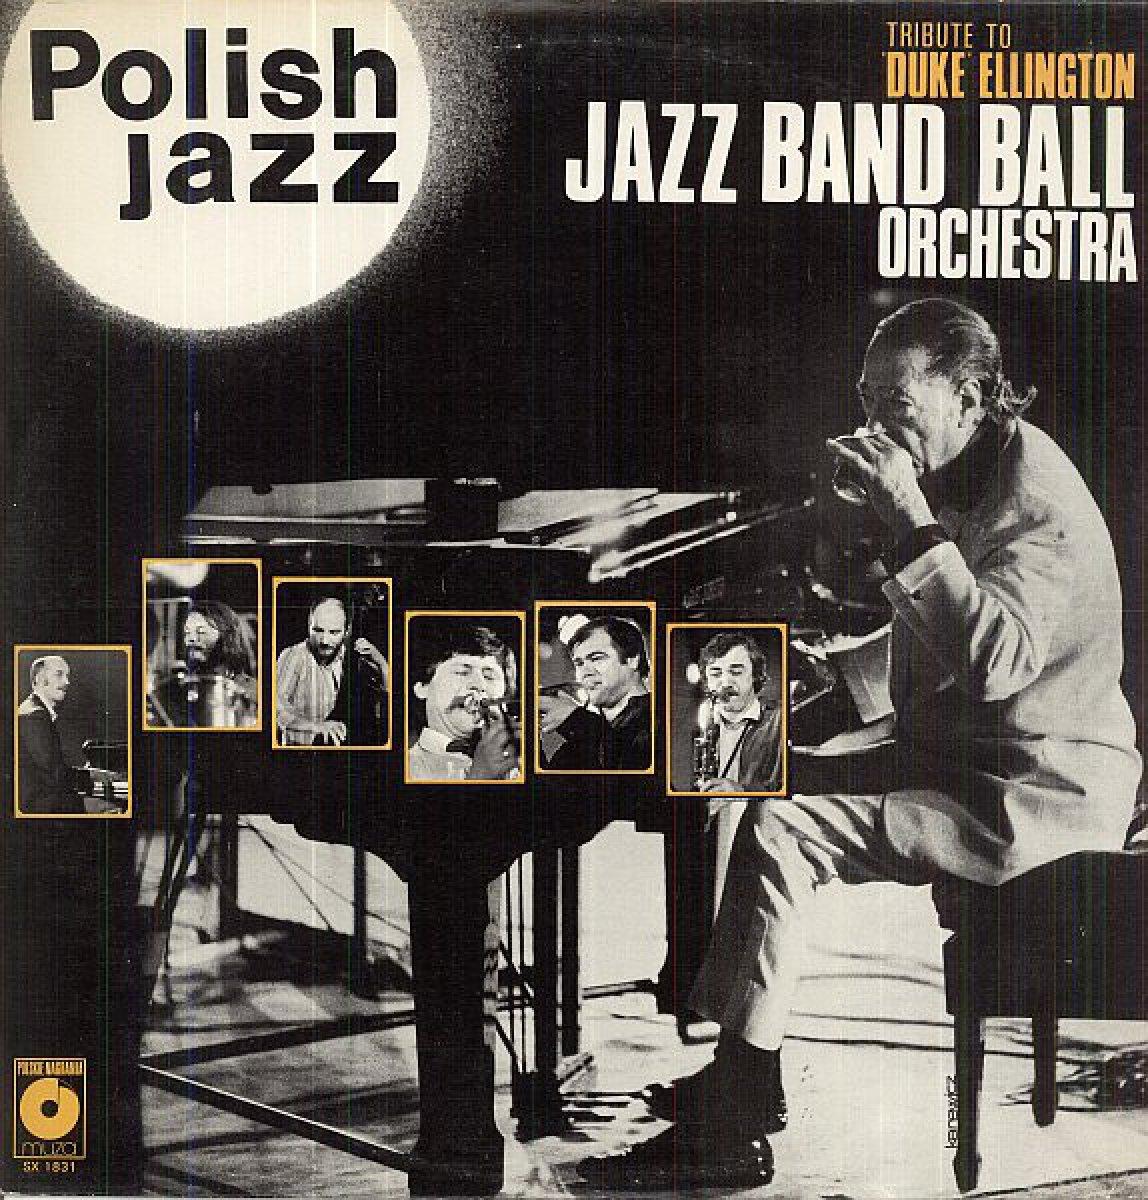 Jazz Band Ball Orchestra – Tribute To Duke Ellington ( Polish Jazz – Vol. 60)